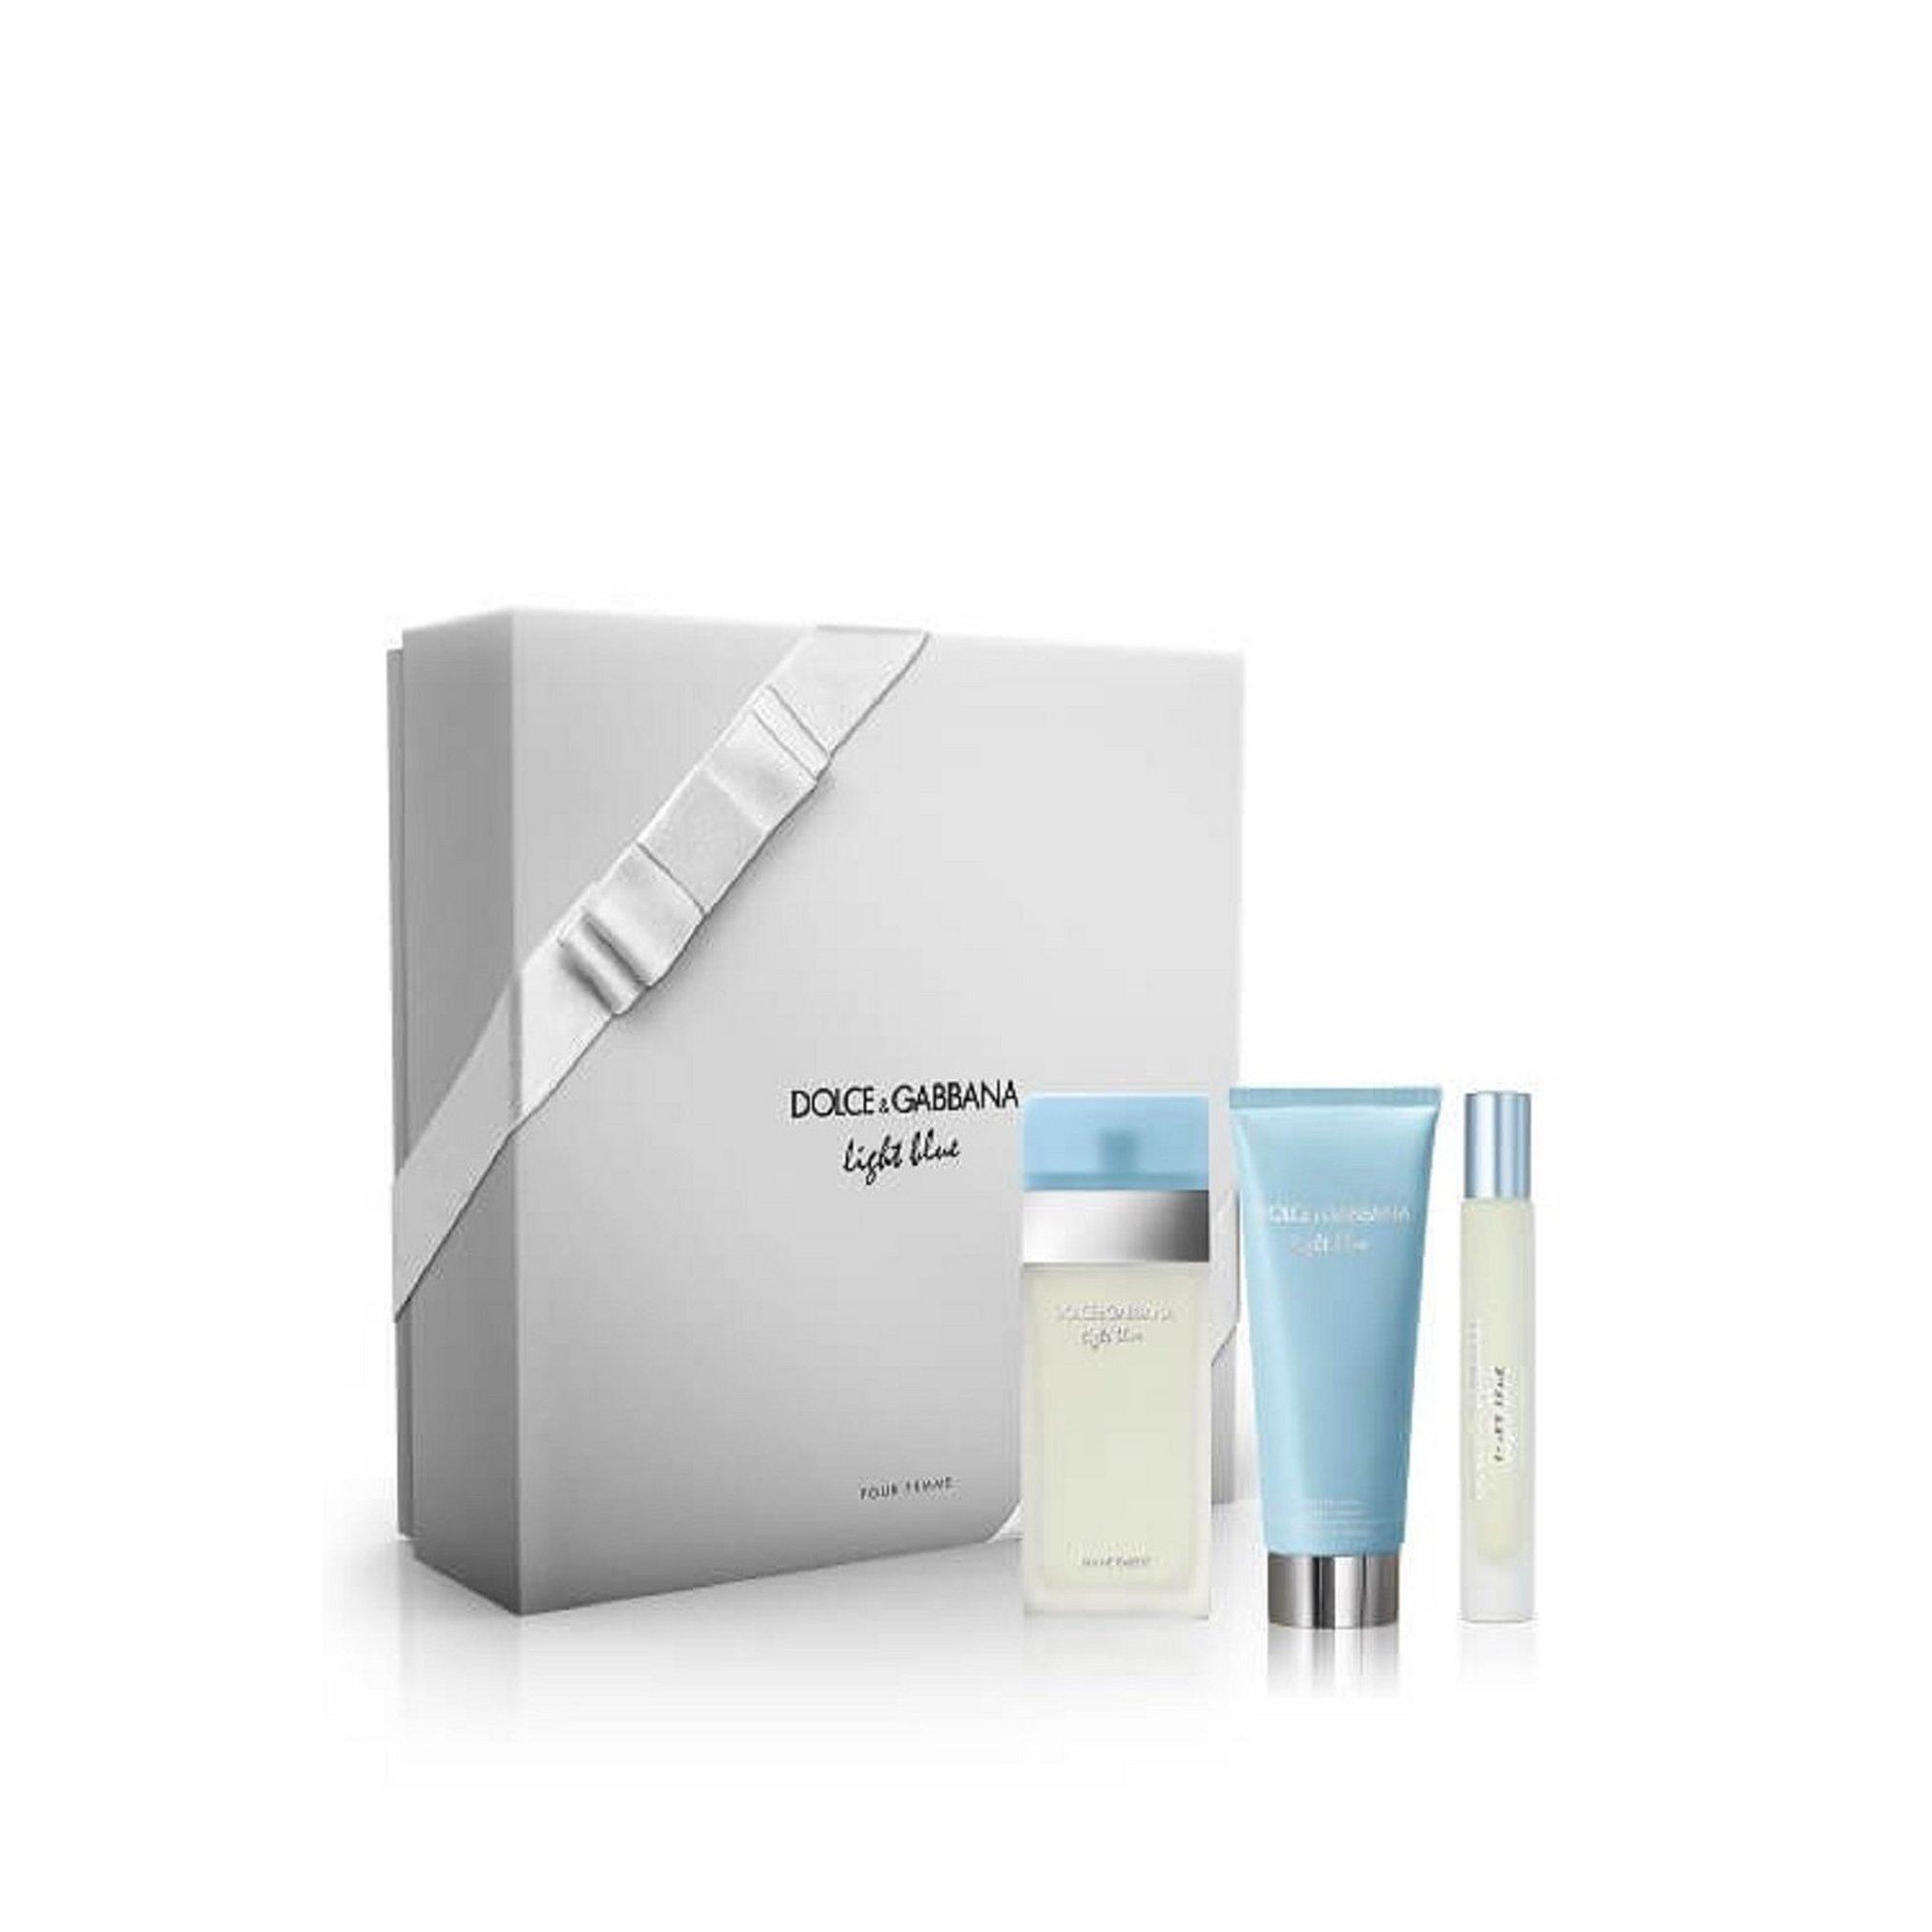 Image of Dolce and Gabbana Light Blue 50ml Eau De Toilette Gift Set